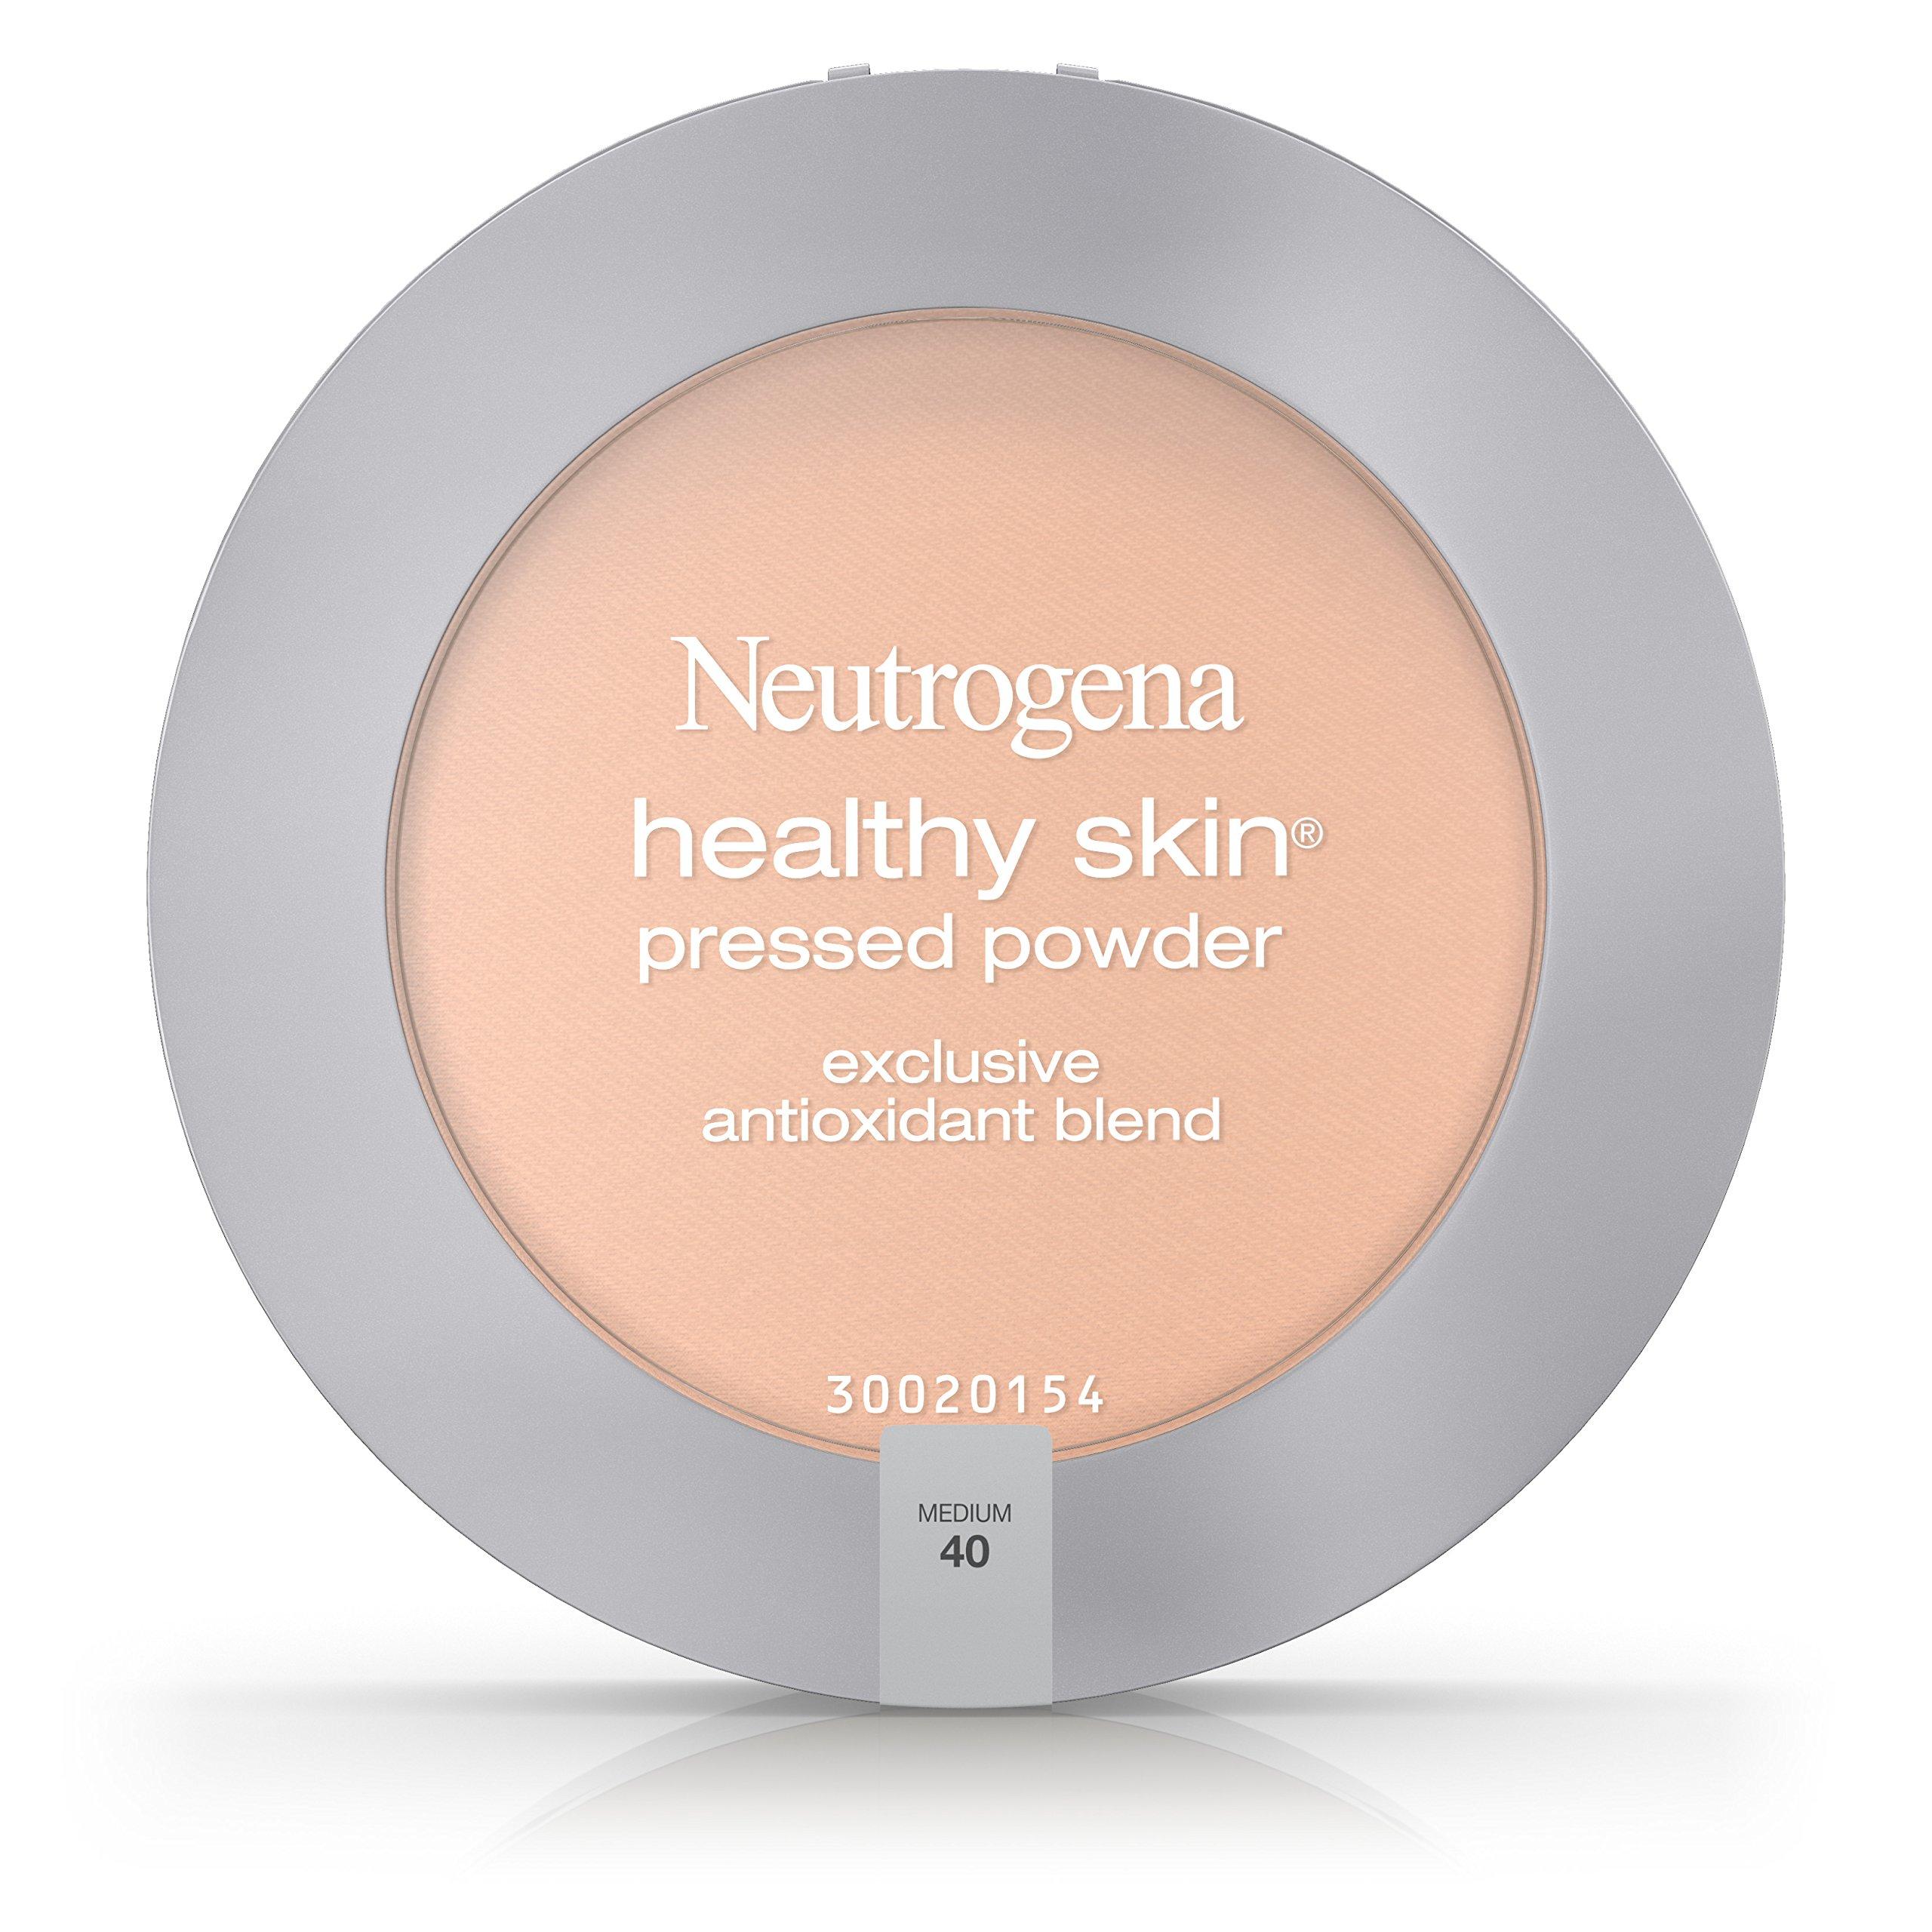 Neutrogena Healthy Skin Pressed Powder Spf 20, Medium 40, 0.34 Oz. (Pack of 2)